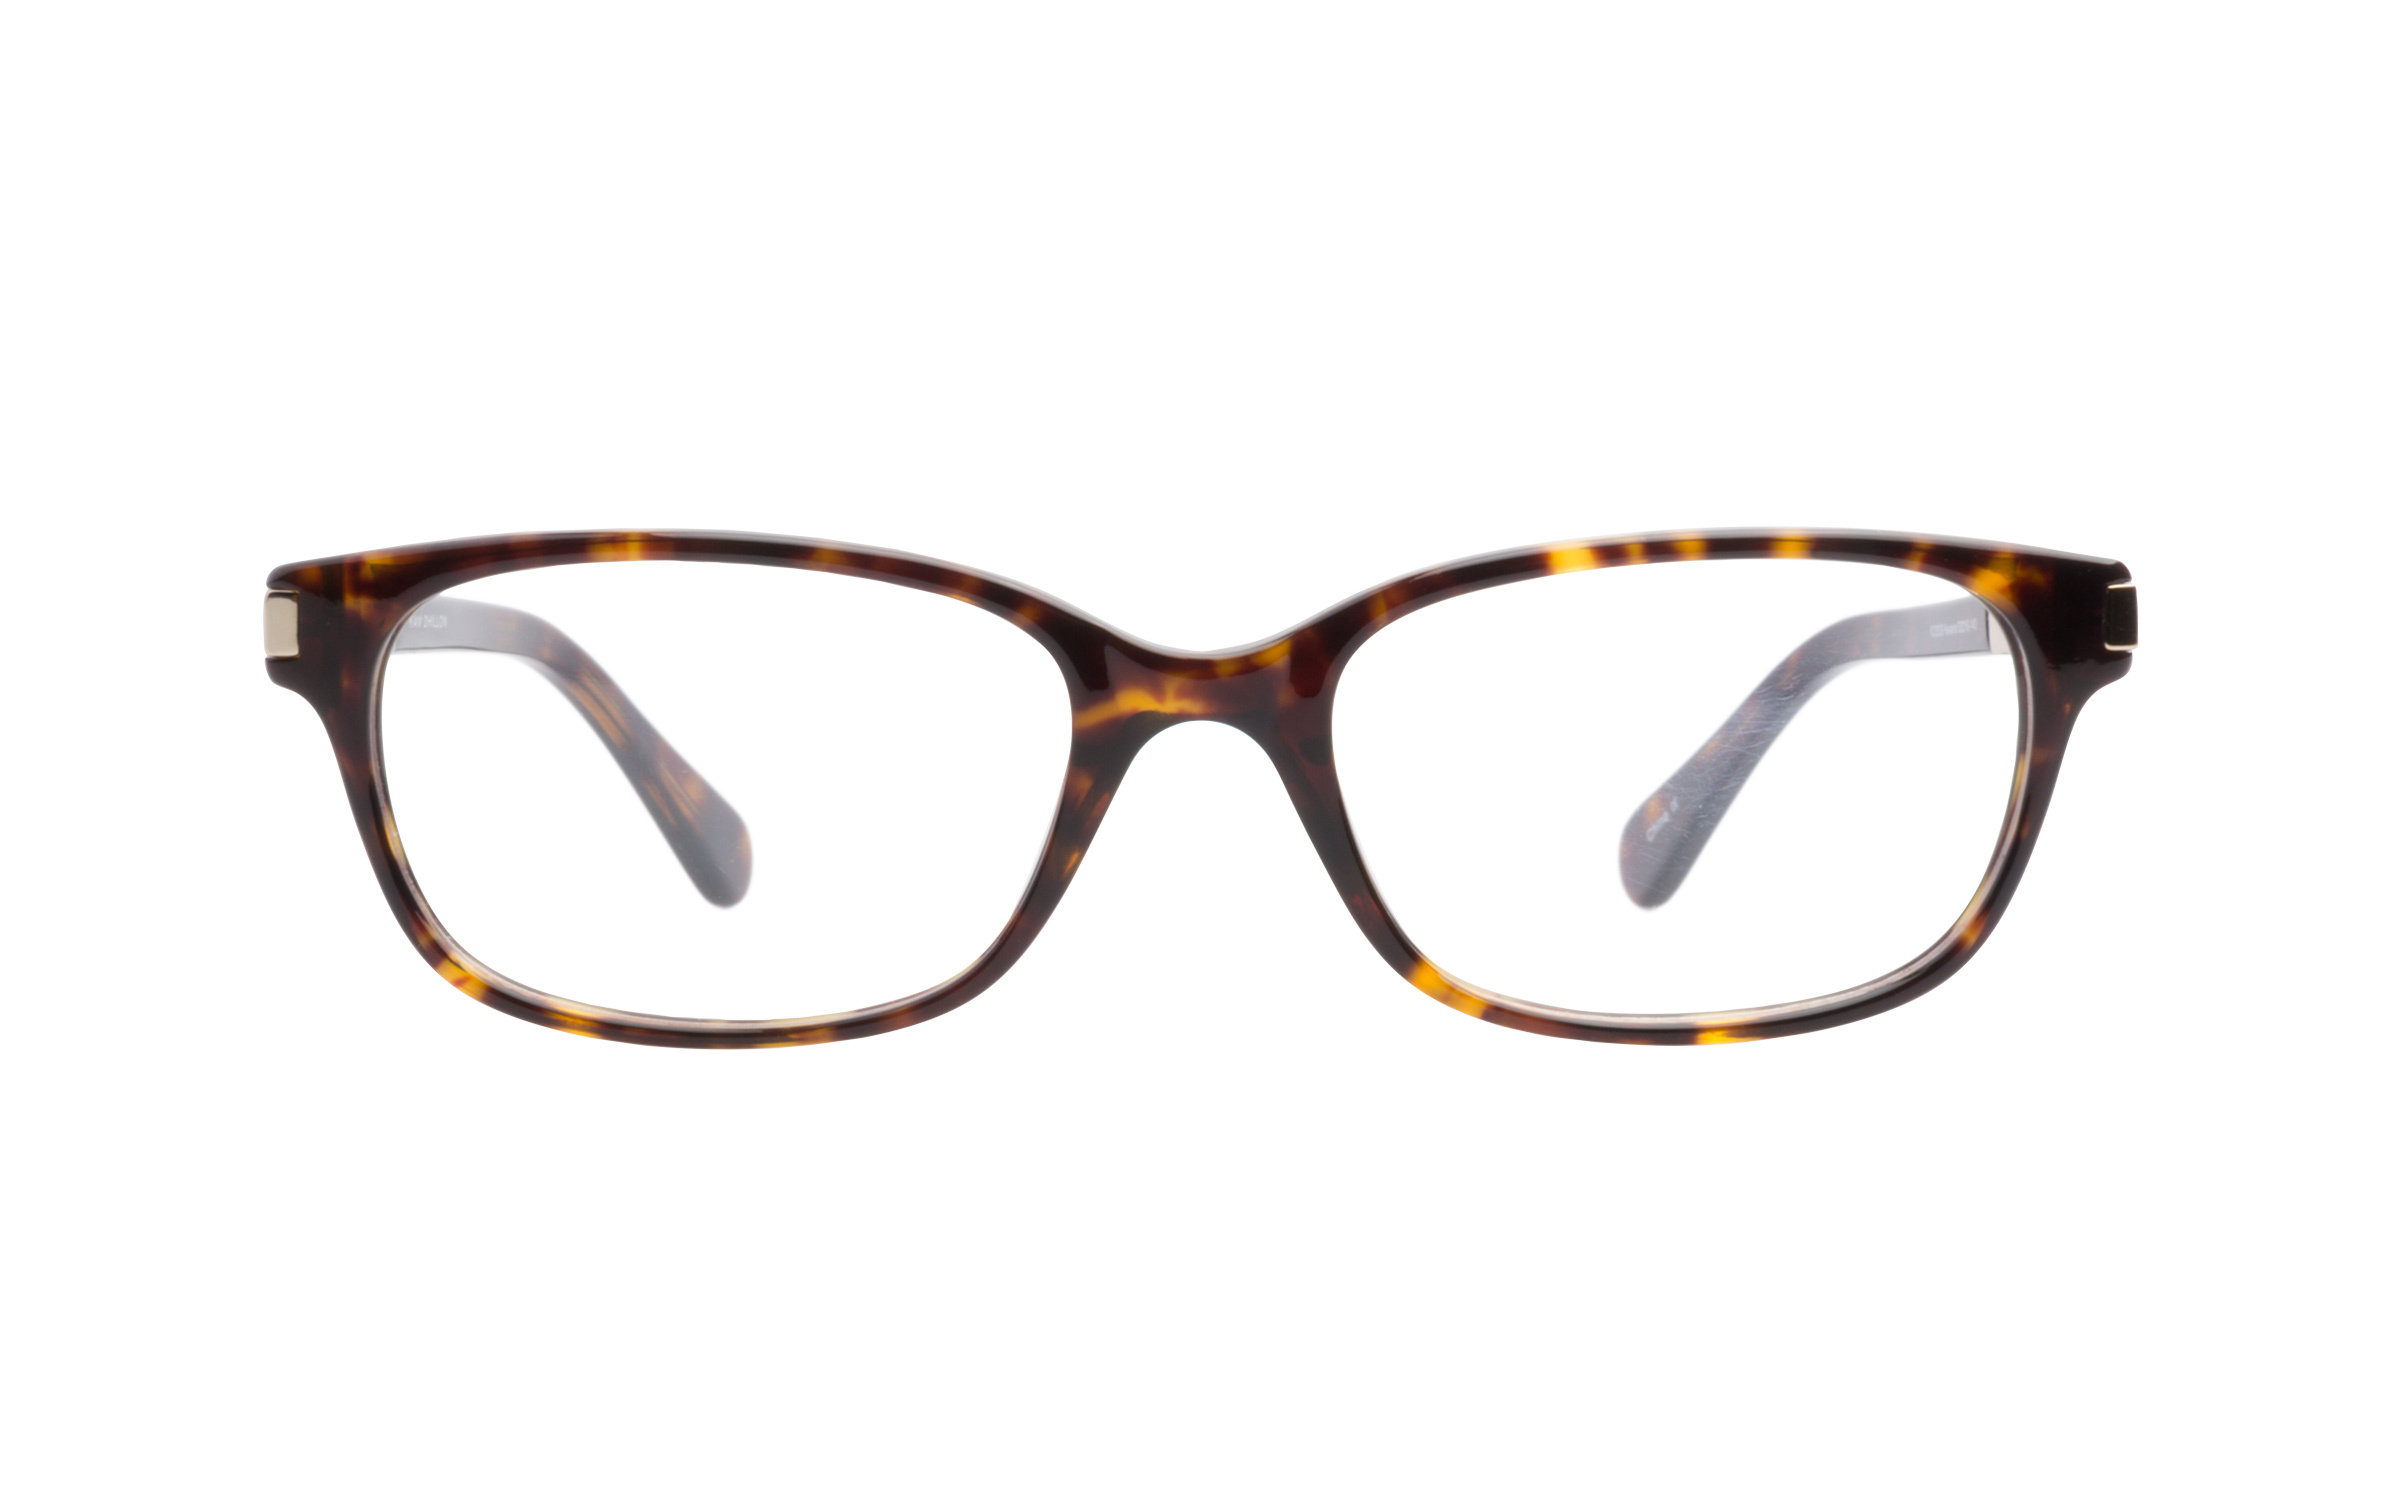 Kam_Dhillon_Womens_Glasses_Retro_Tortoise_Metal_Online_Coastal